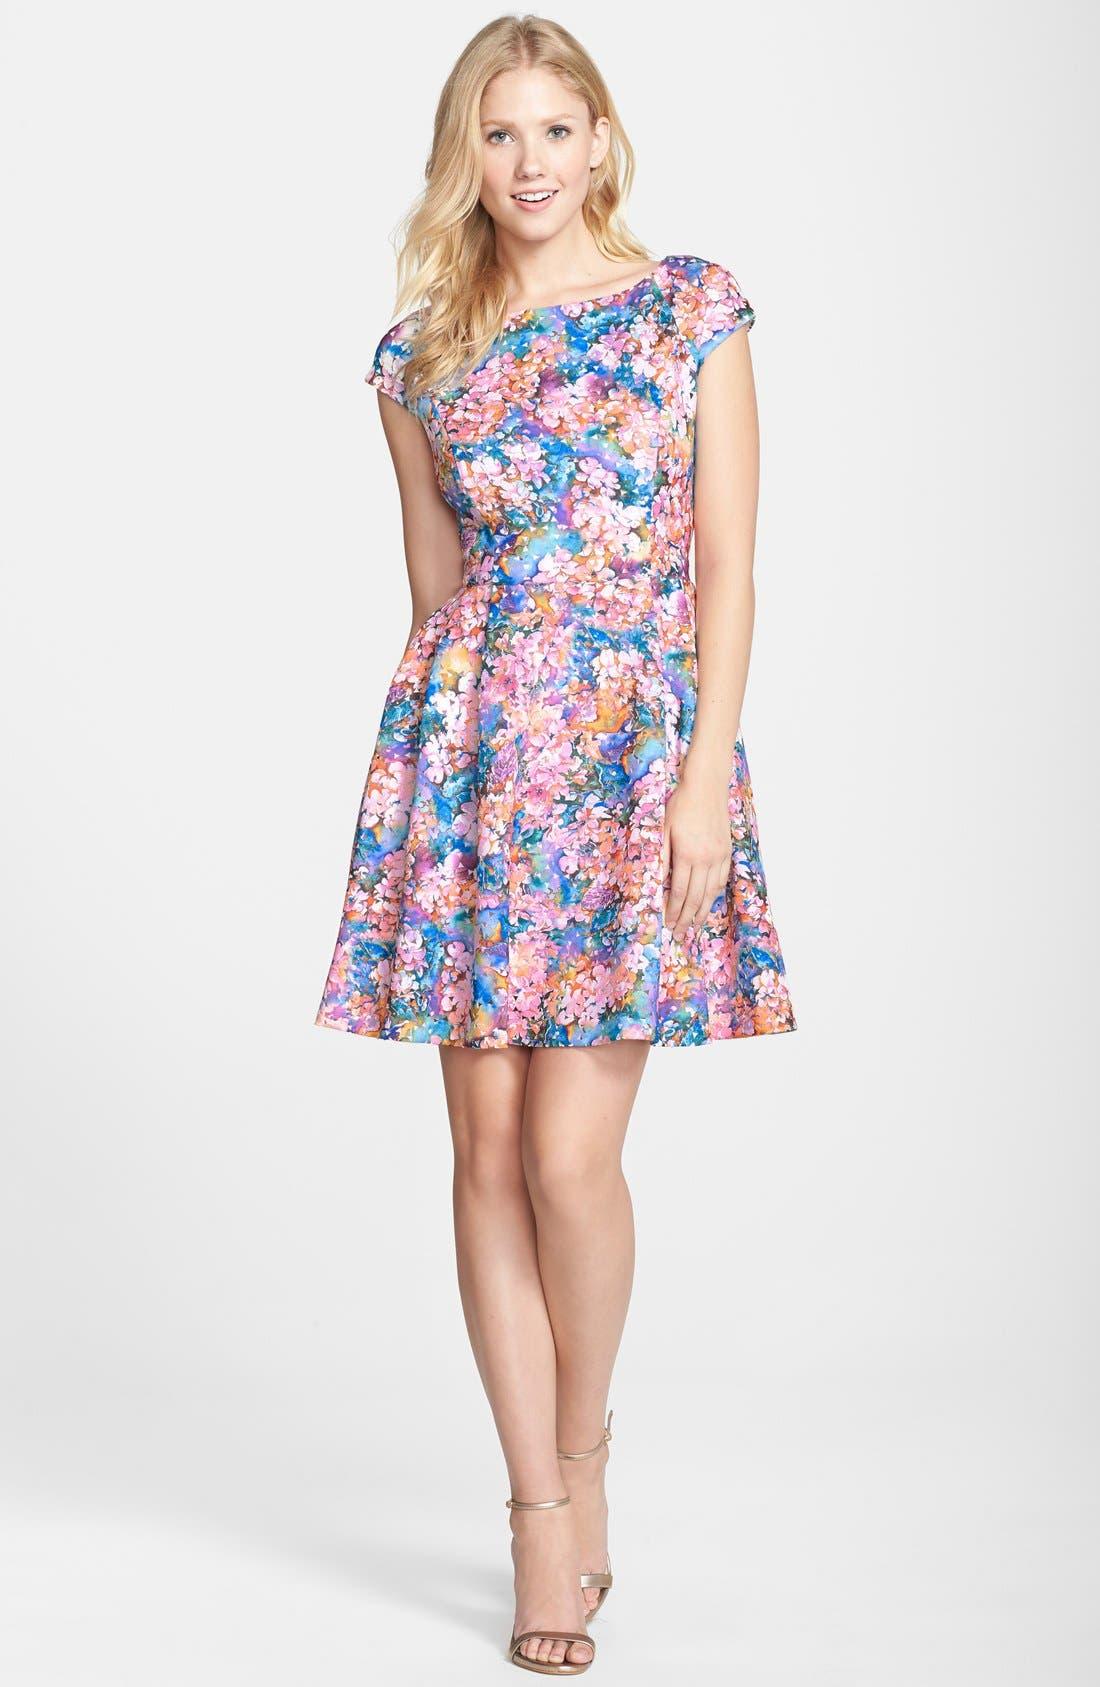 BETSEY JOHNSON,                             Laser Cut Floral Print Scuba Fit & Flare Dress,                             Alternate thumbnail 2, color,                             650